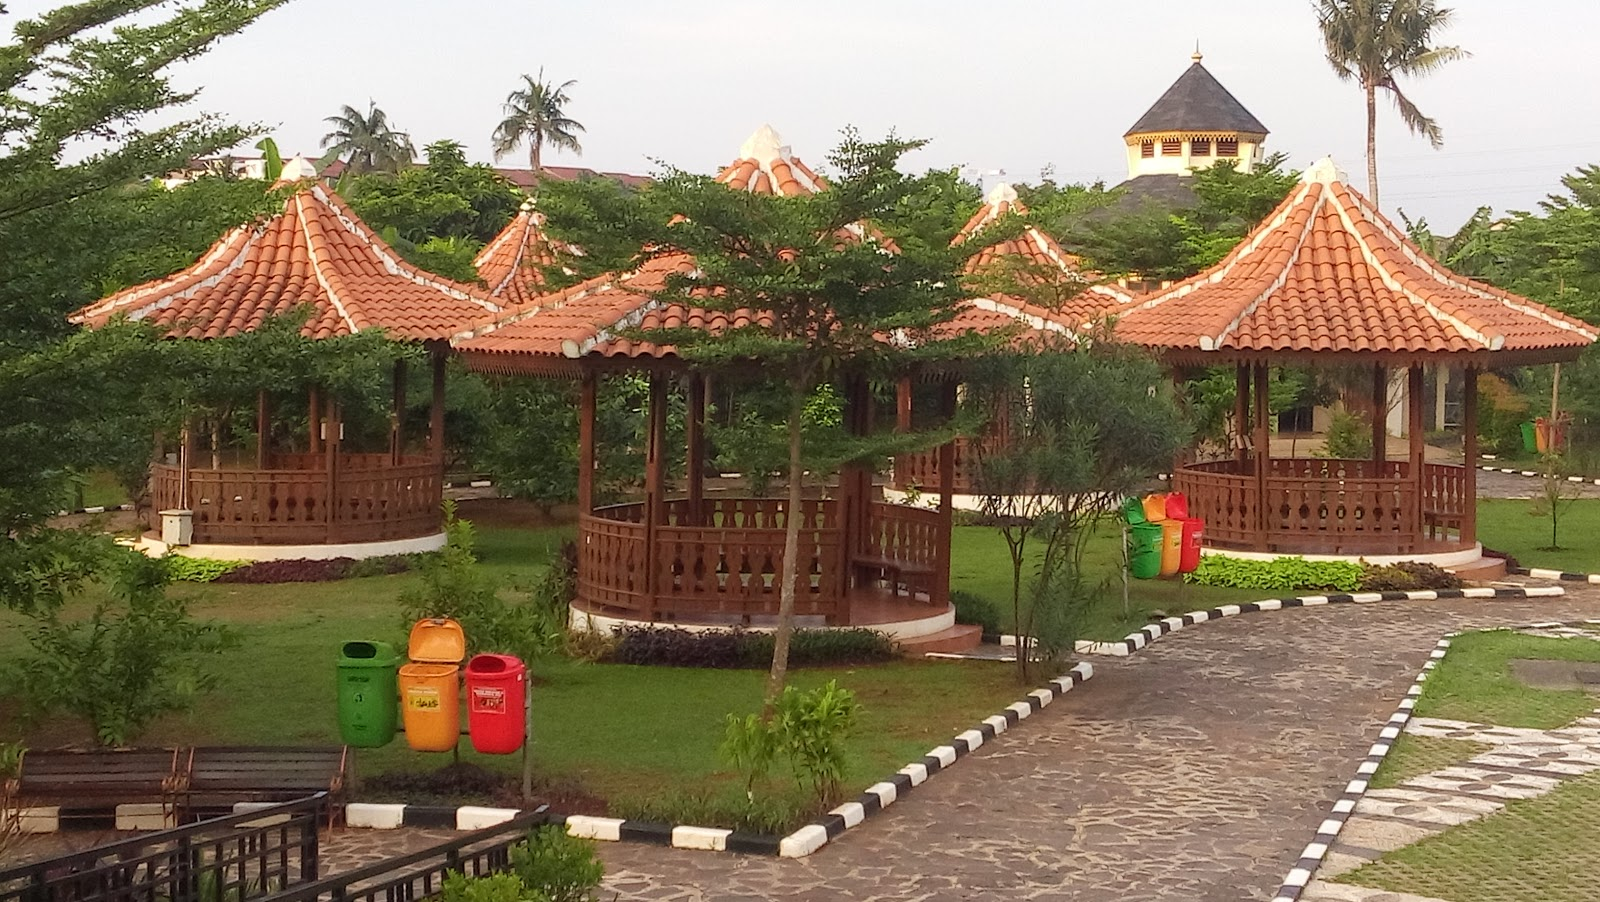 du lịch Jakarta ở Indonesia